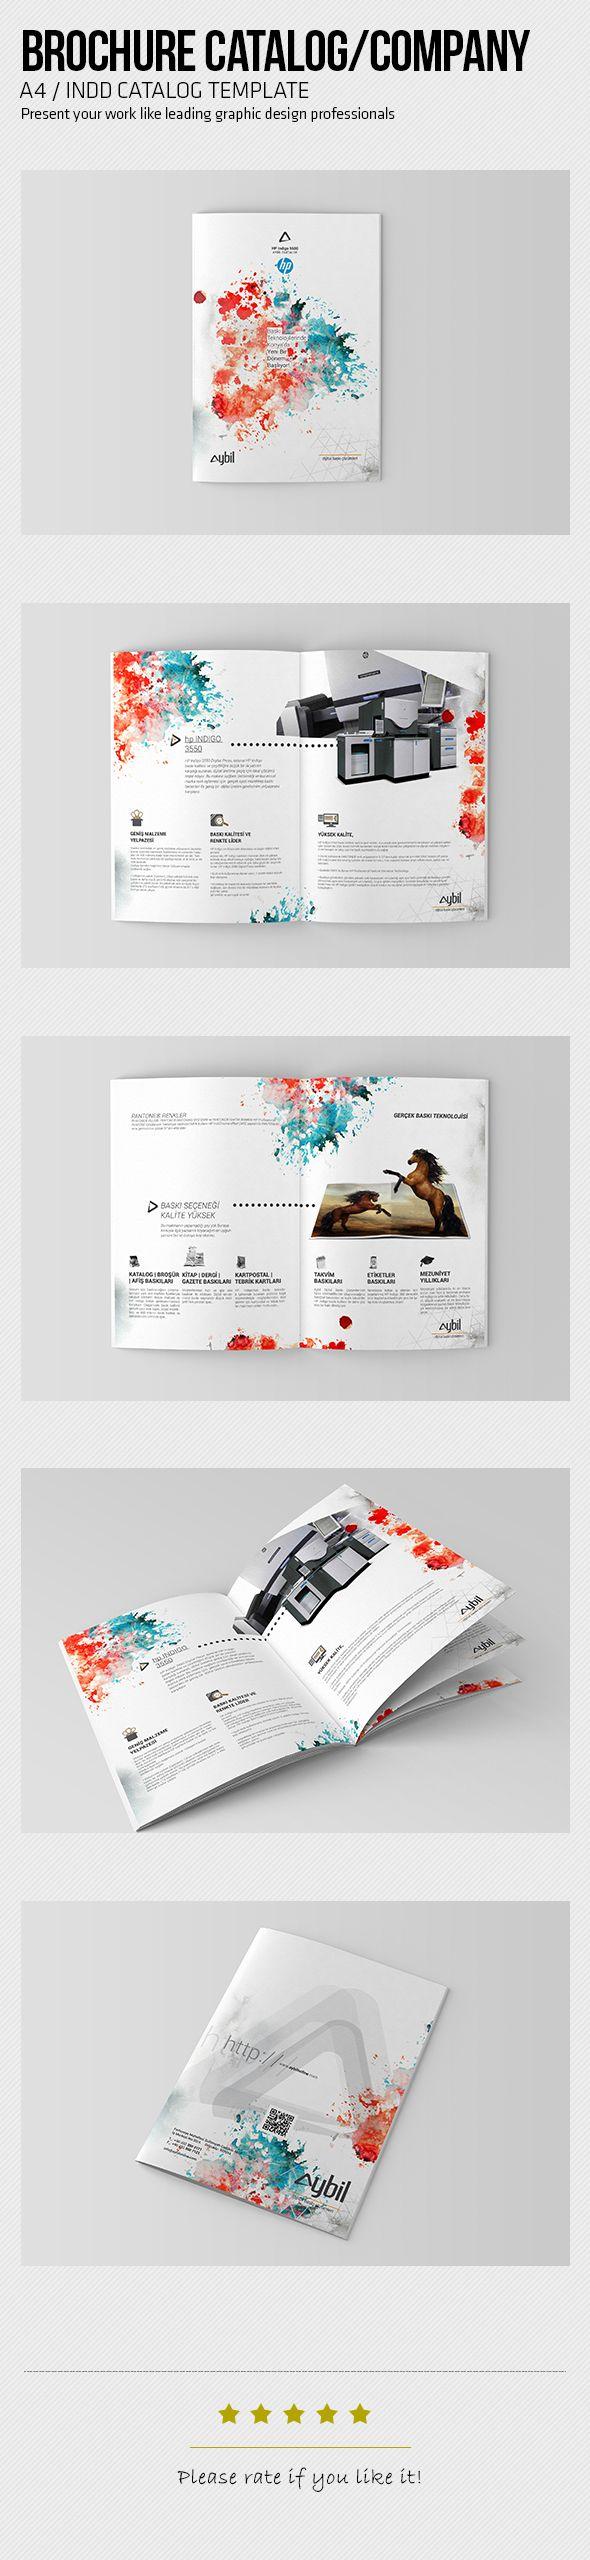 a4 brochure, advertising, advertising brochure, annual report, annual report brochure, brochure design, business, business brochure, catalog, catalog brochure, catalogue, clean brochure, company profile, corporate, corporate brochure, creative brochure, modern brochure, multipurpose, professional brochure, simple brochure